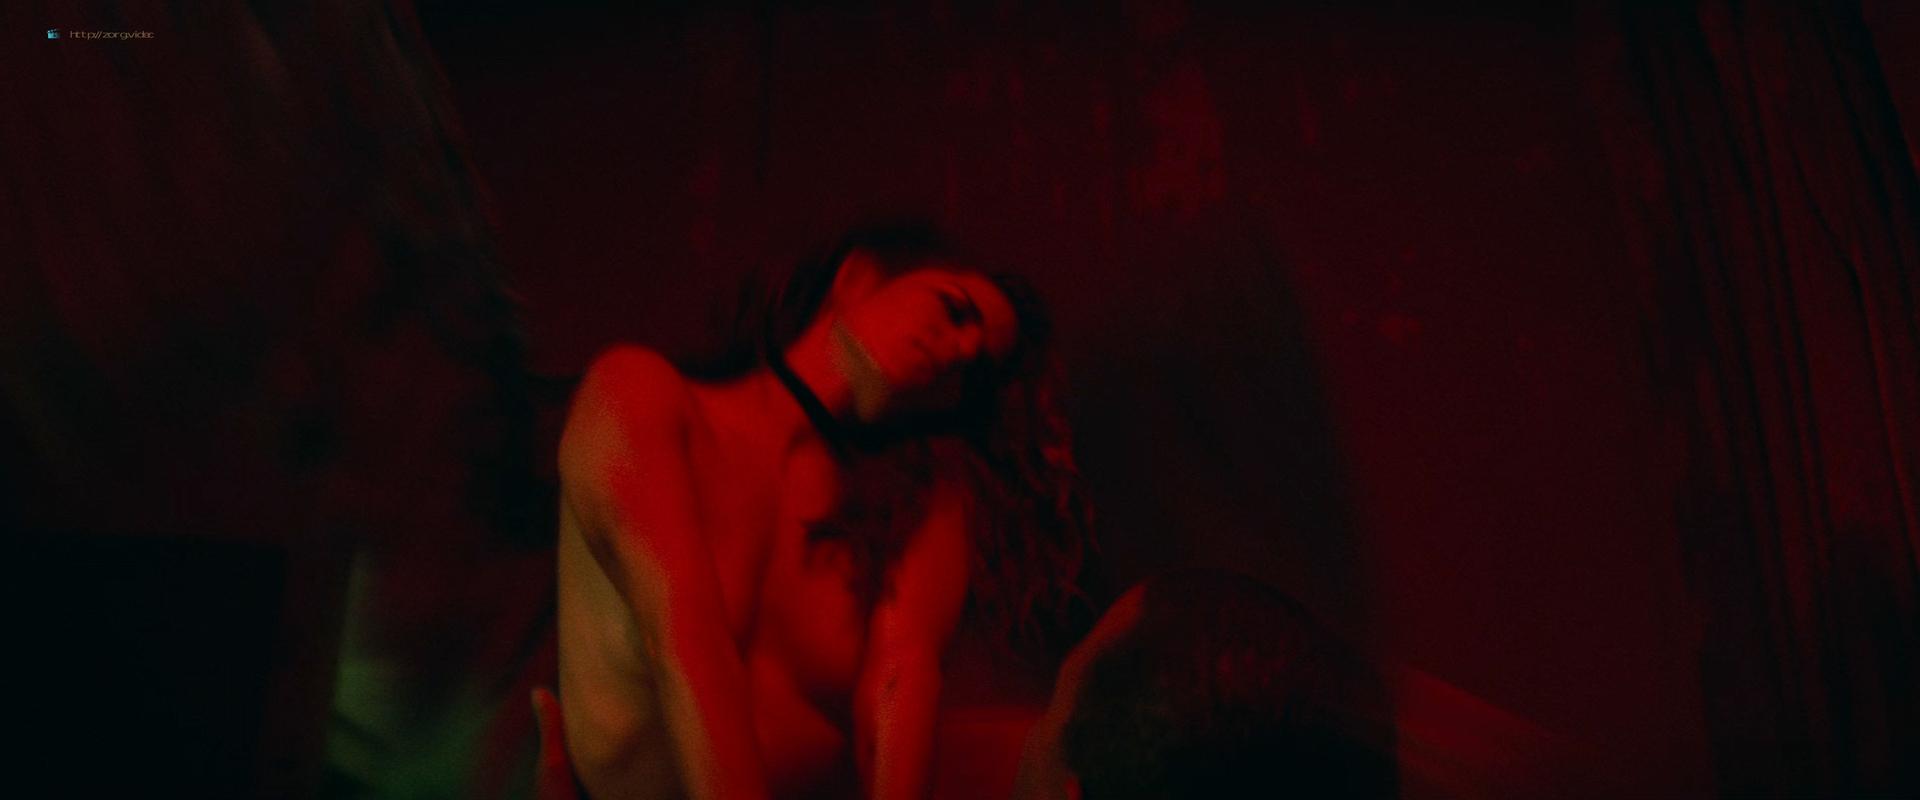 Karla Souza nude hot sex - Jacob's Ladder (2019) HD 1080p (3)